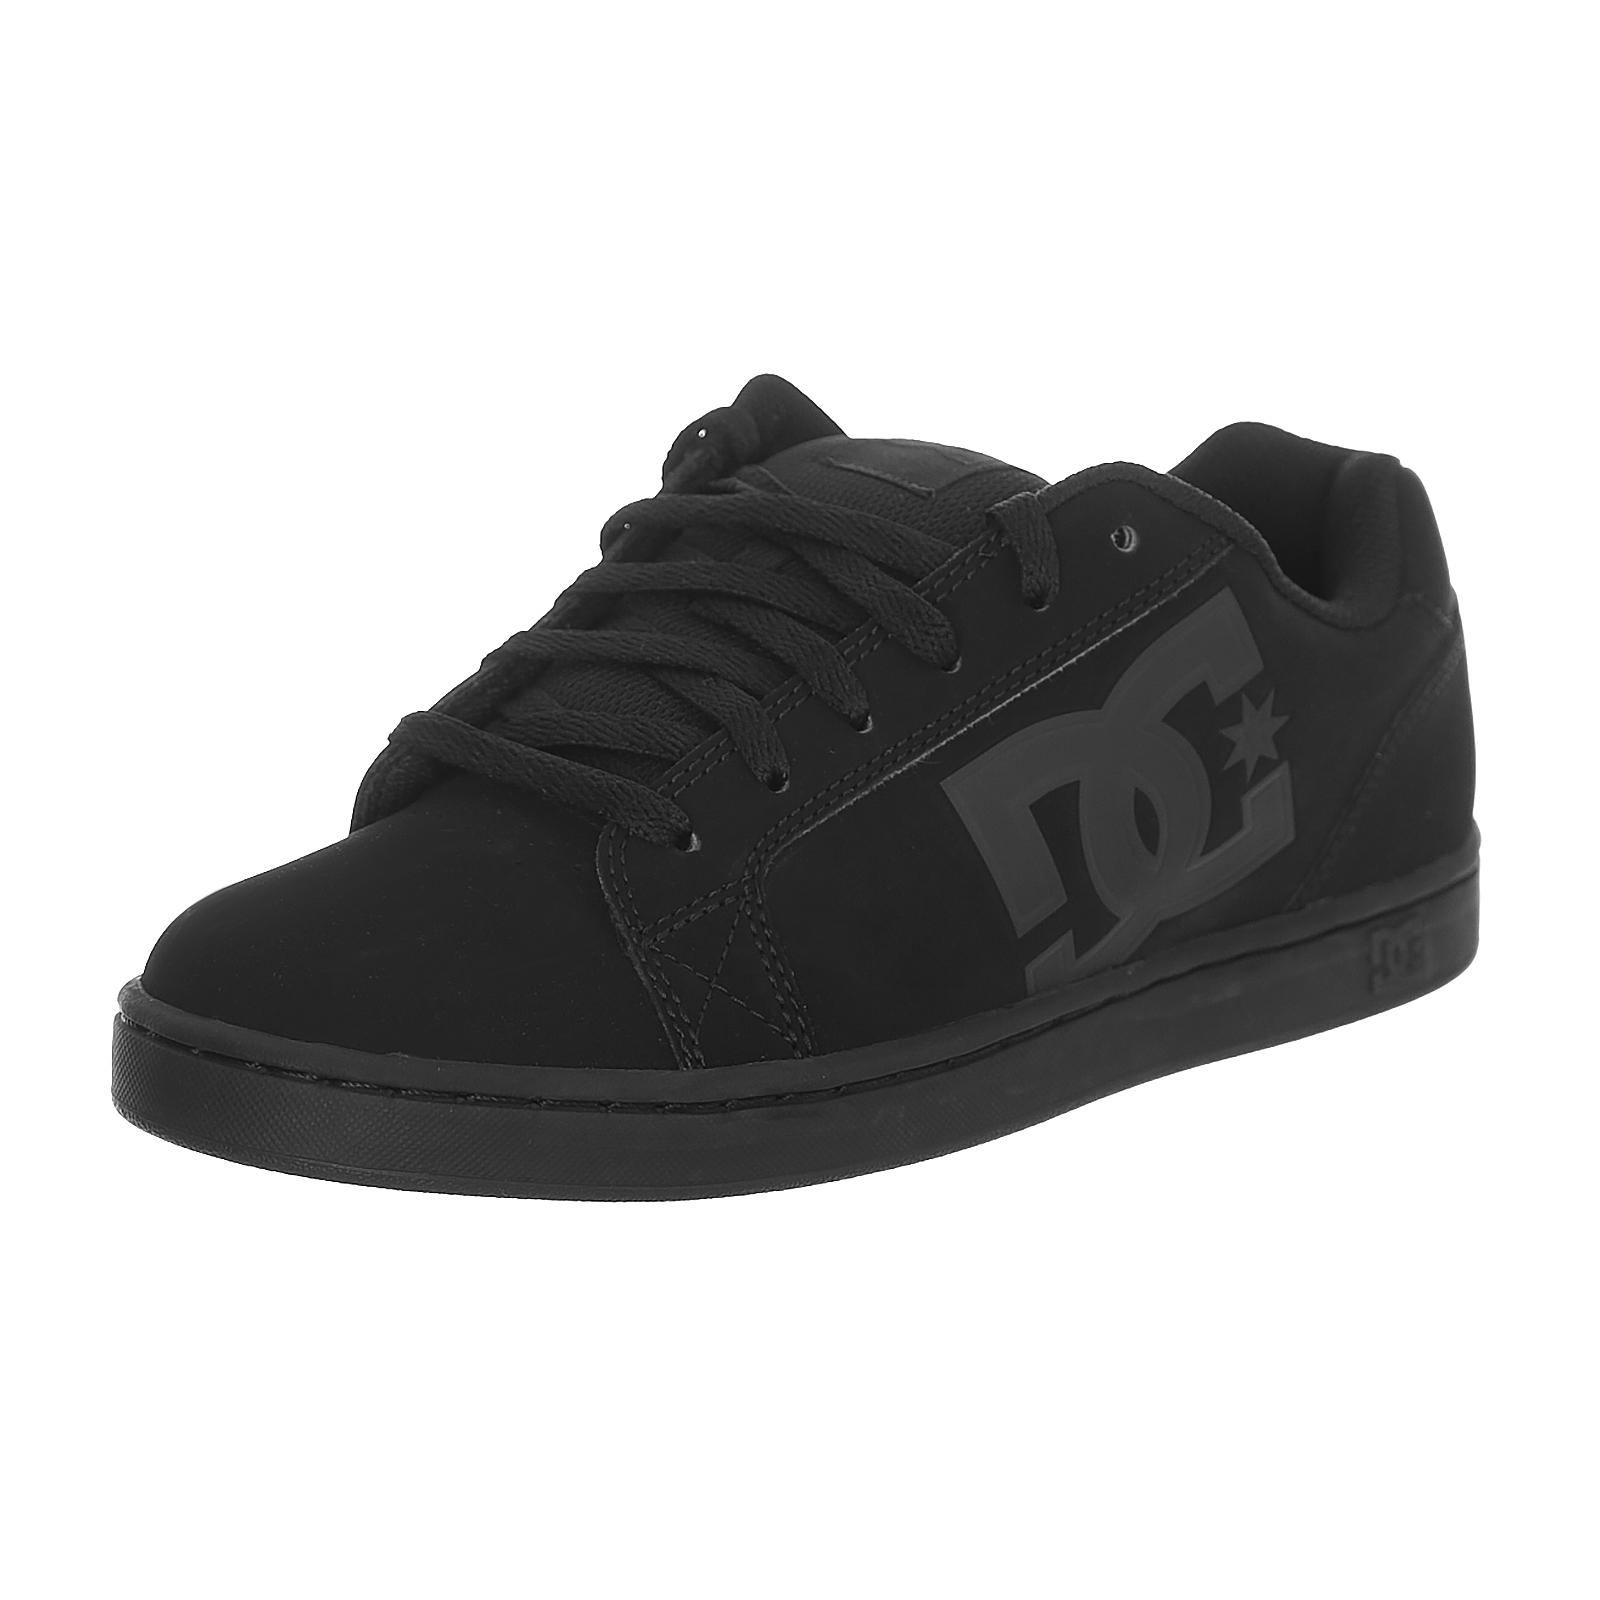 Dc Sneakers Dc Shoes Serial Graffik Black Black Black Nero  80f2f82612e